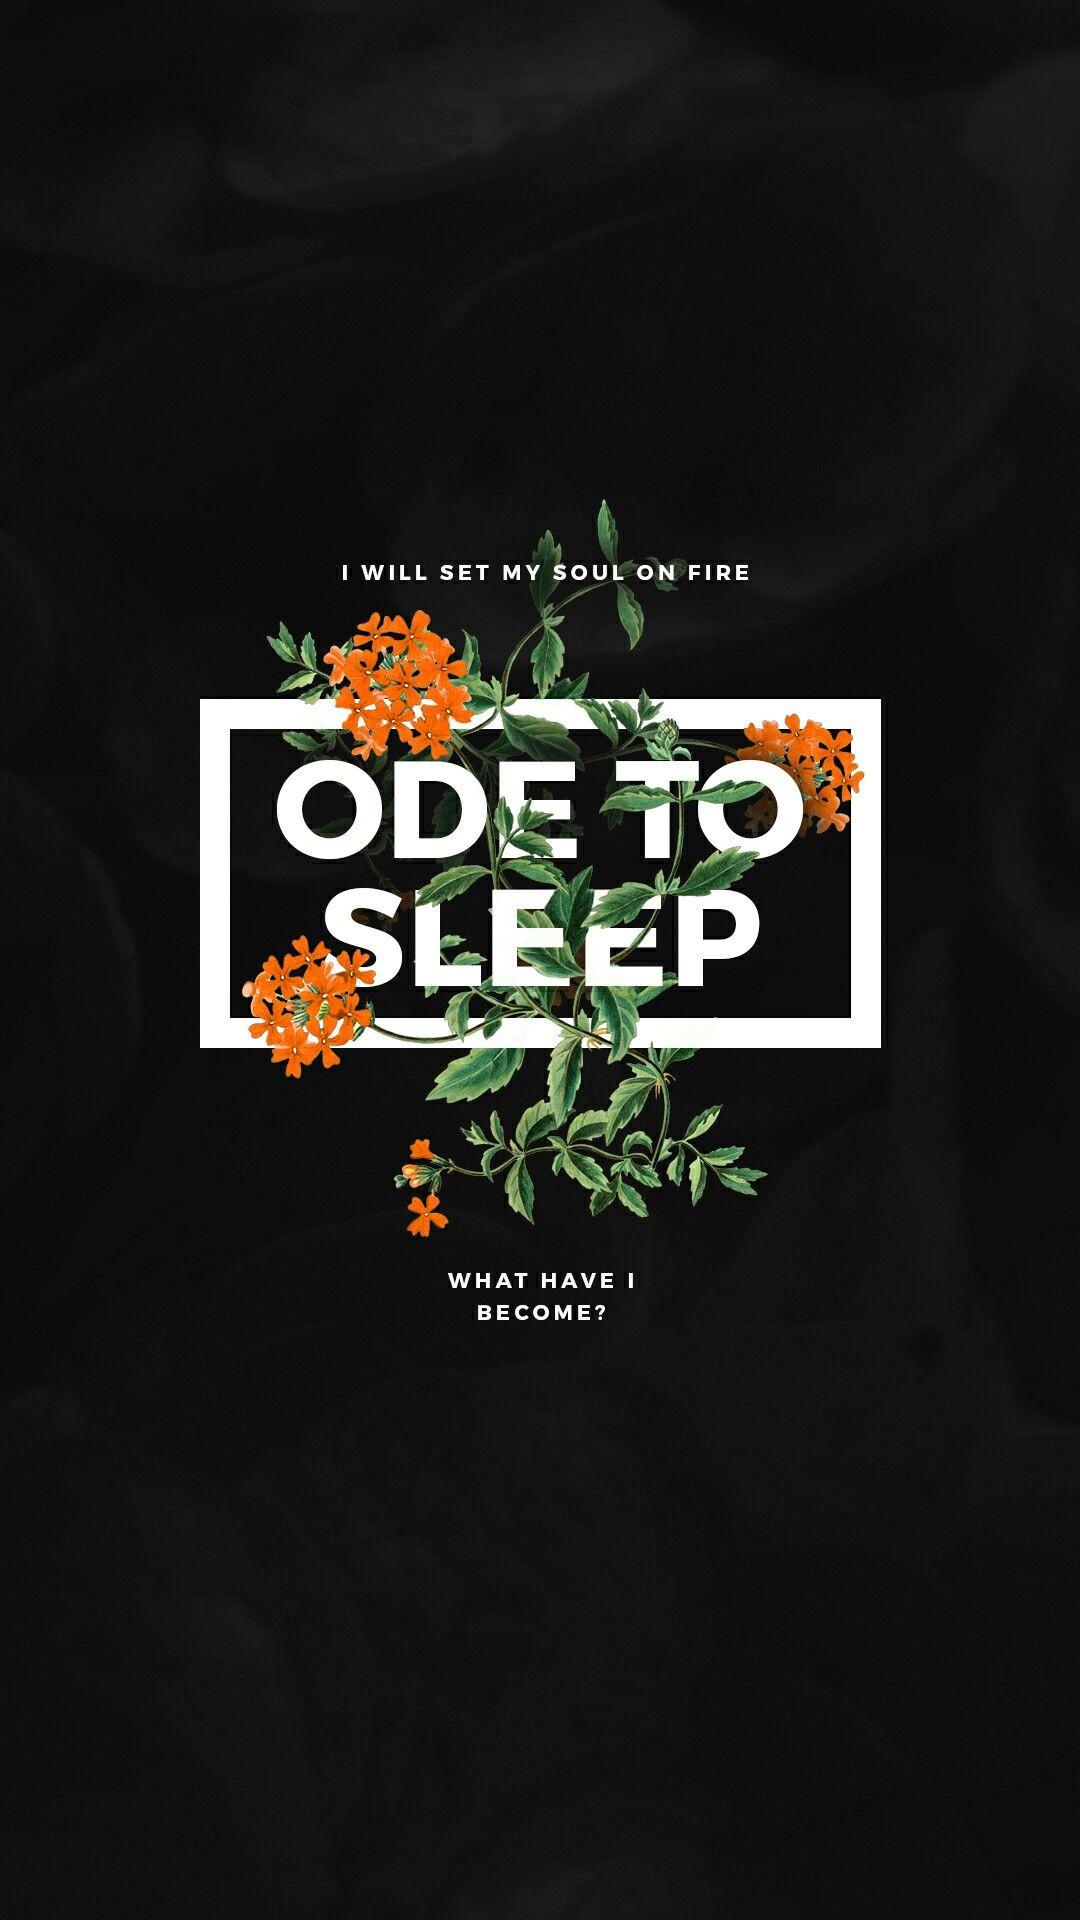 Ode to sleep lyrics  With flowers | Design in 2019 | Twenty